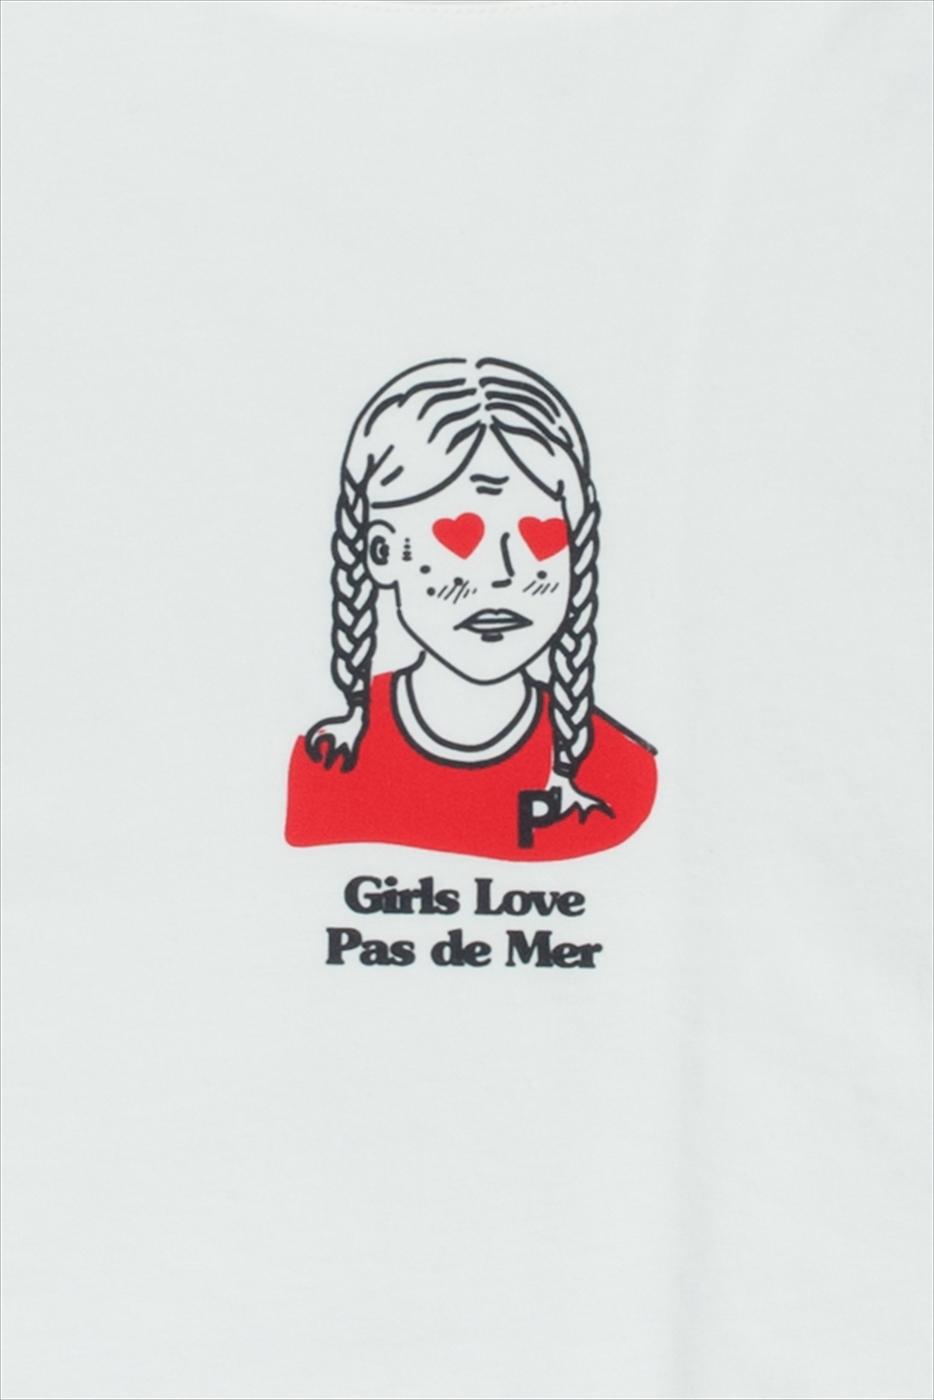 【PAS DE MER/パドゥメ】GIRLS CROPPED T-SHIRT  ウィメンズクロップドTシャツ / WHITE